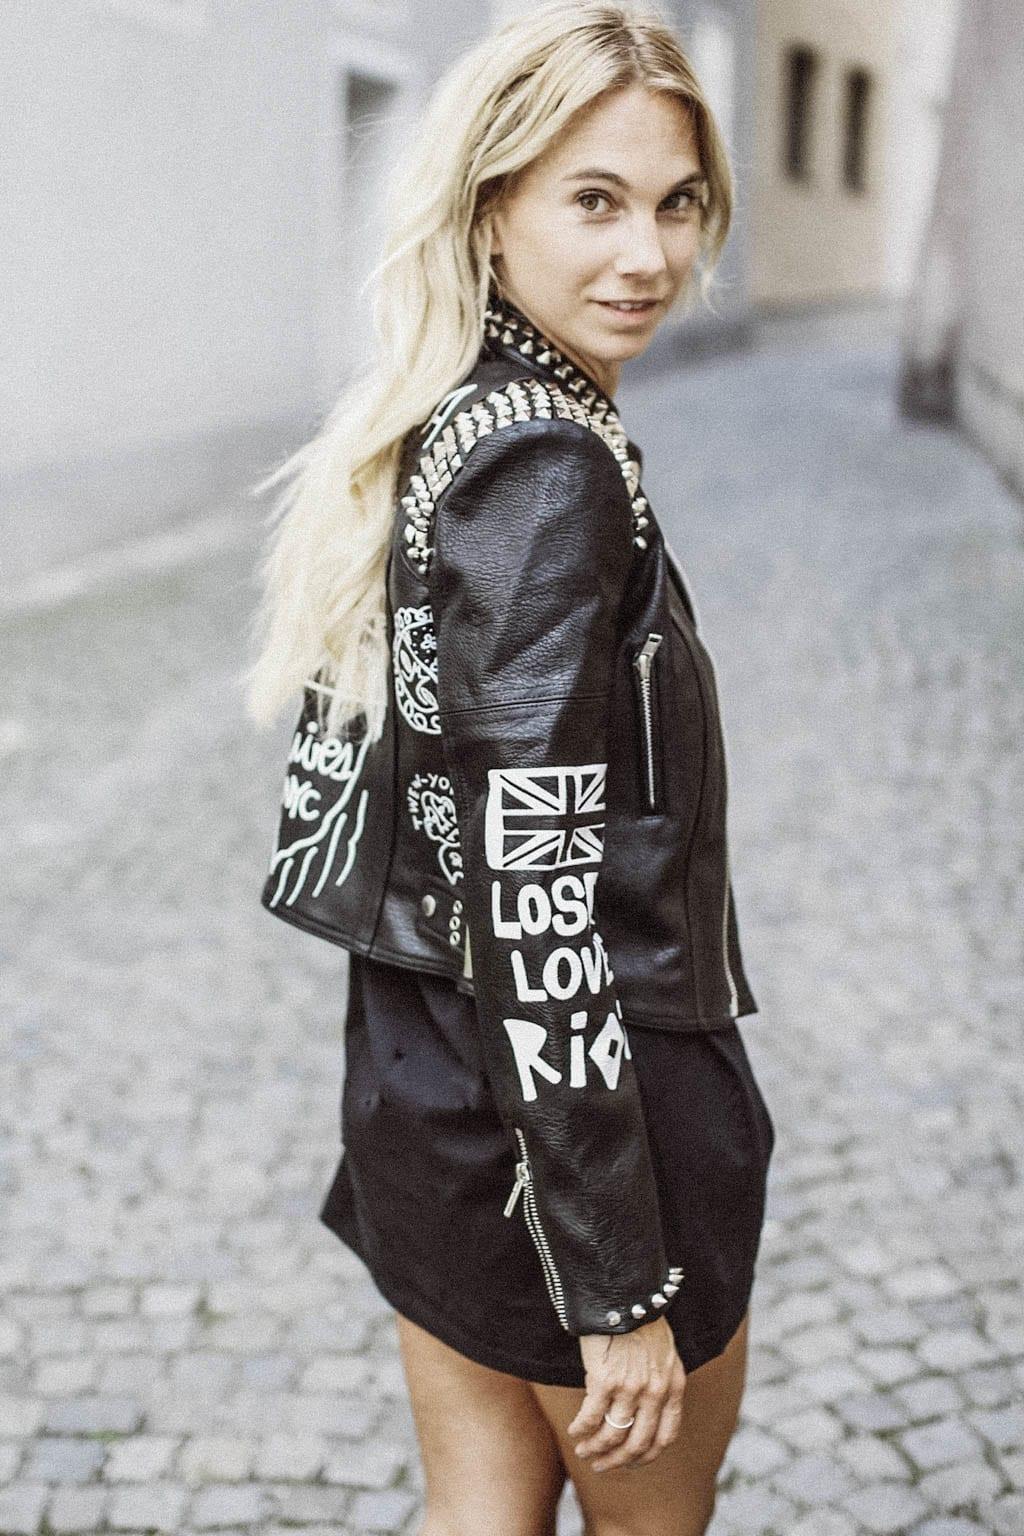 CK-Constantlly-K-Fashion-Street-Style-Blog-Rieger-Fashion-Salzburg-constantlyk.com-8800